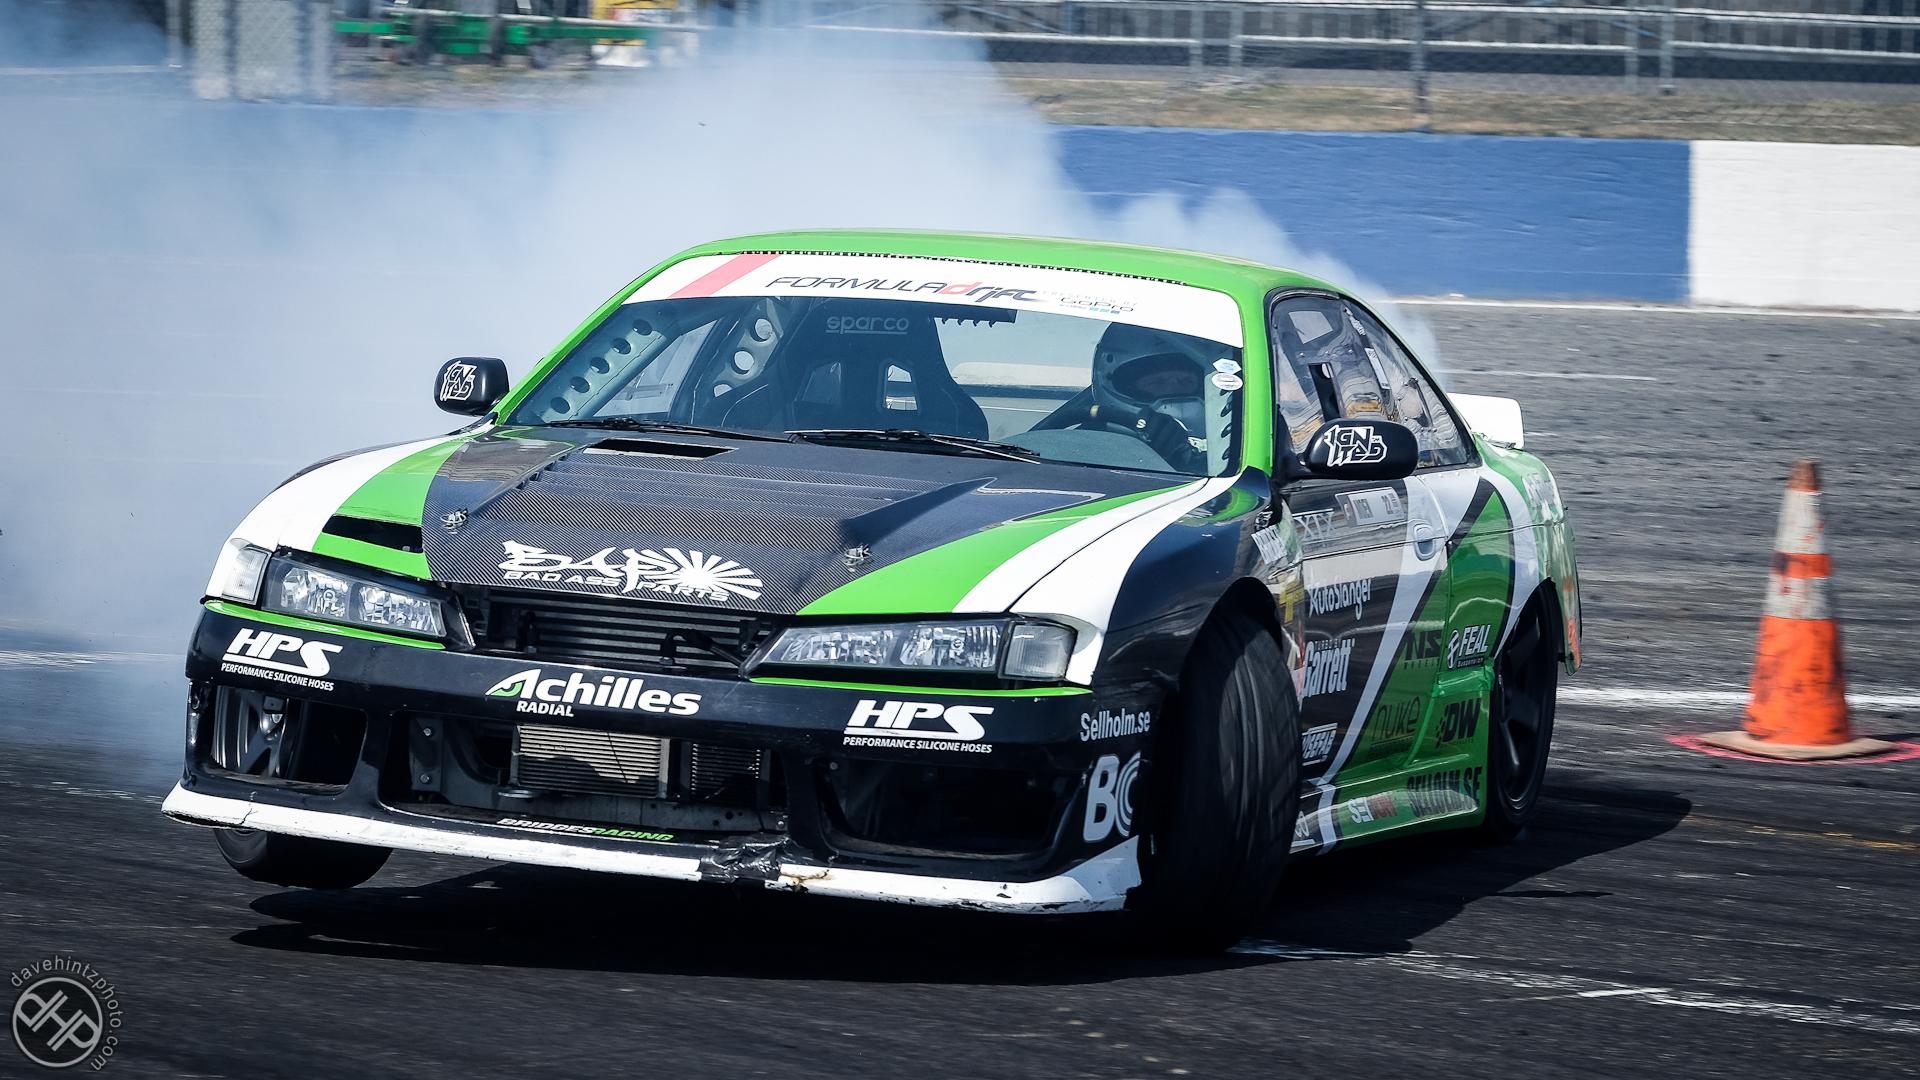 Formula Drift 2014 Round 5 David Hintze (2 of 2).jpg